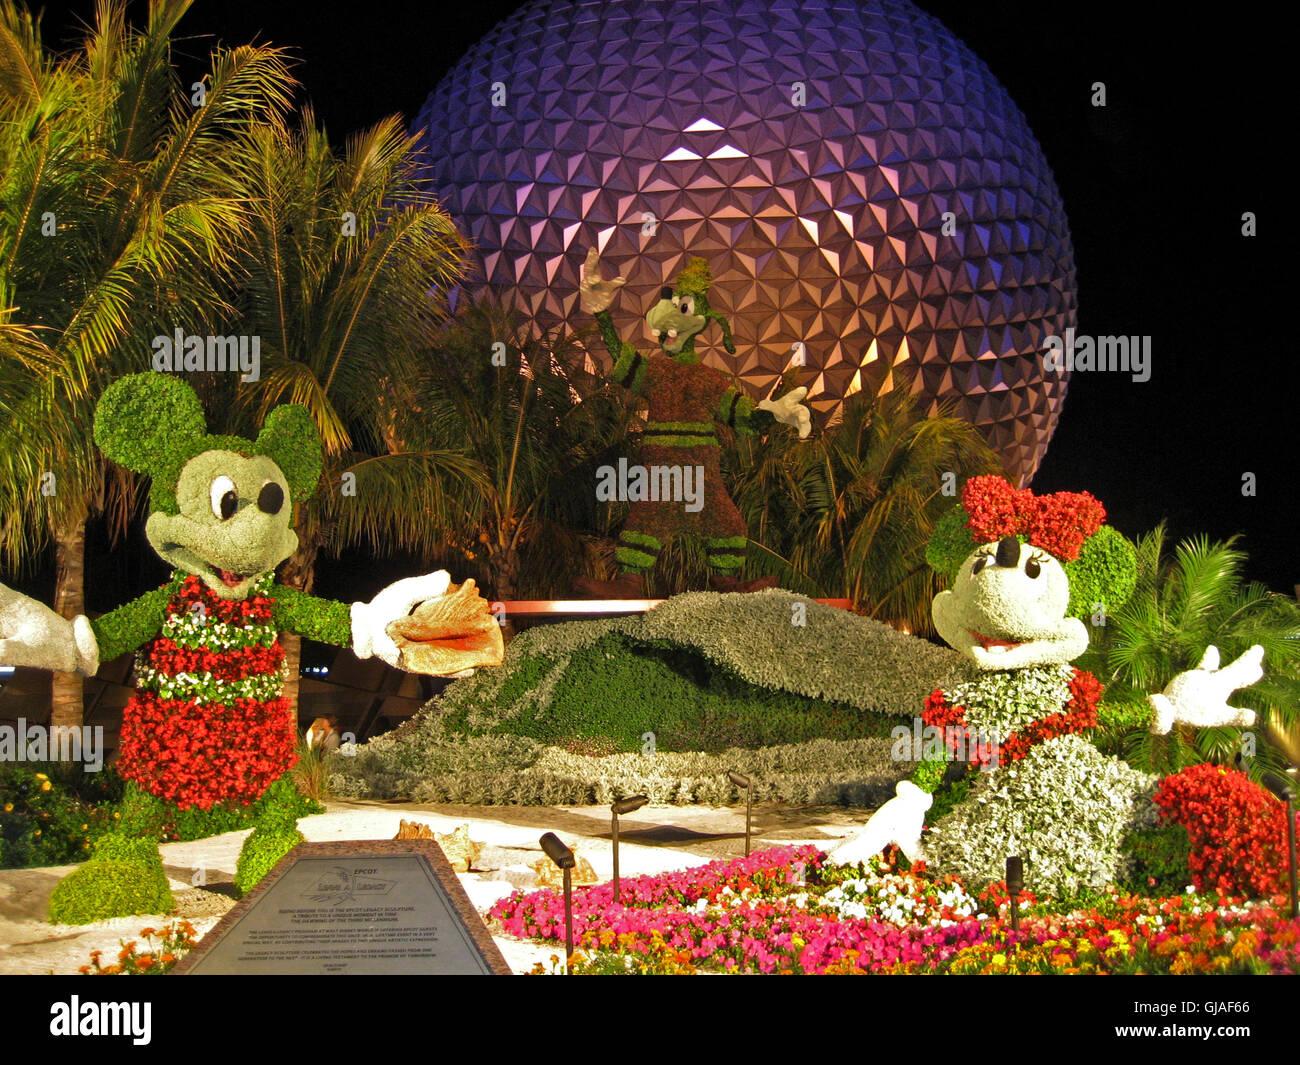 Orlando, Florida, USA. April 29th, 2008. Display for Epcot Flower ...